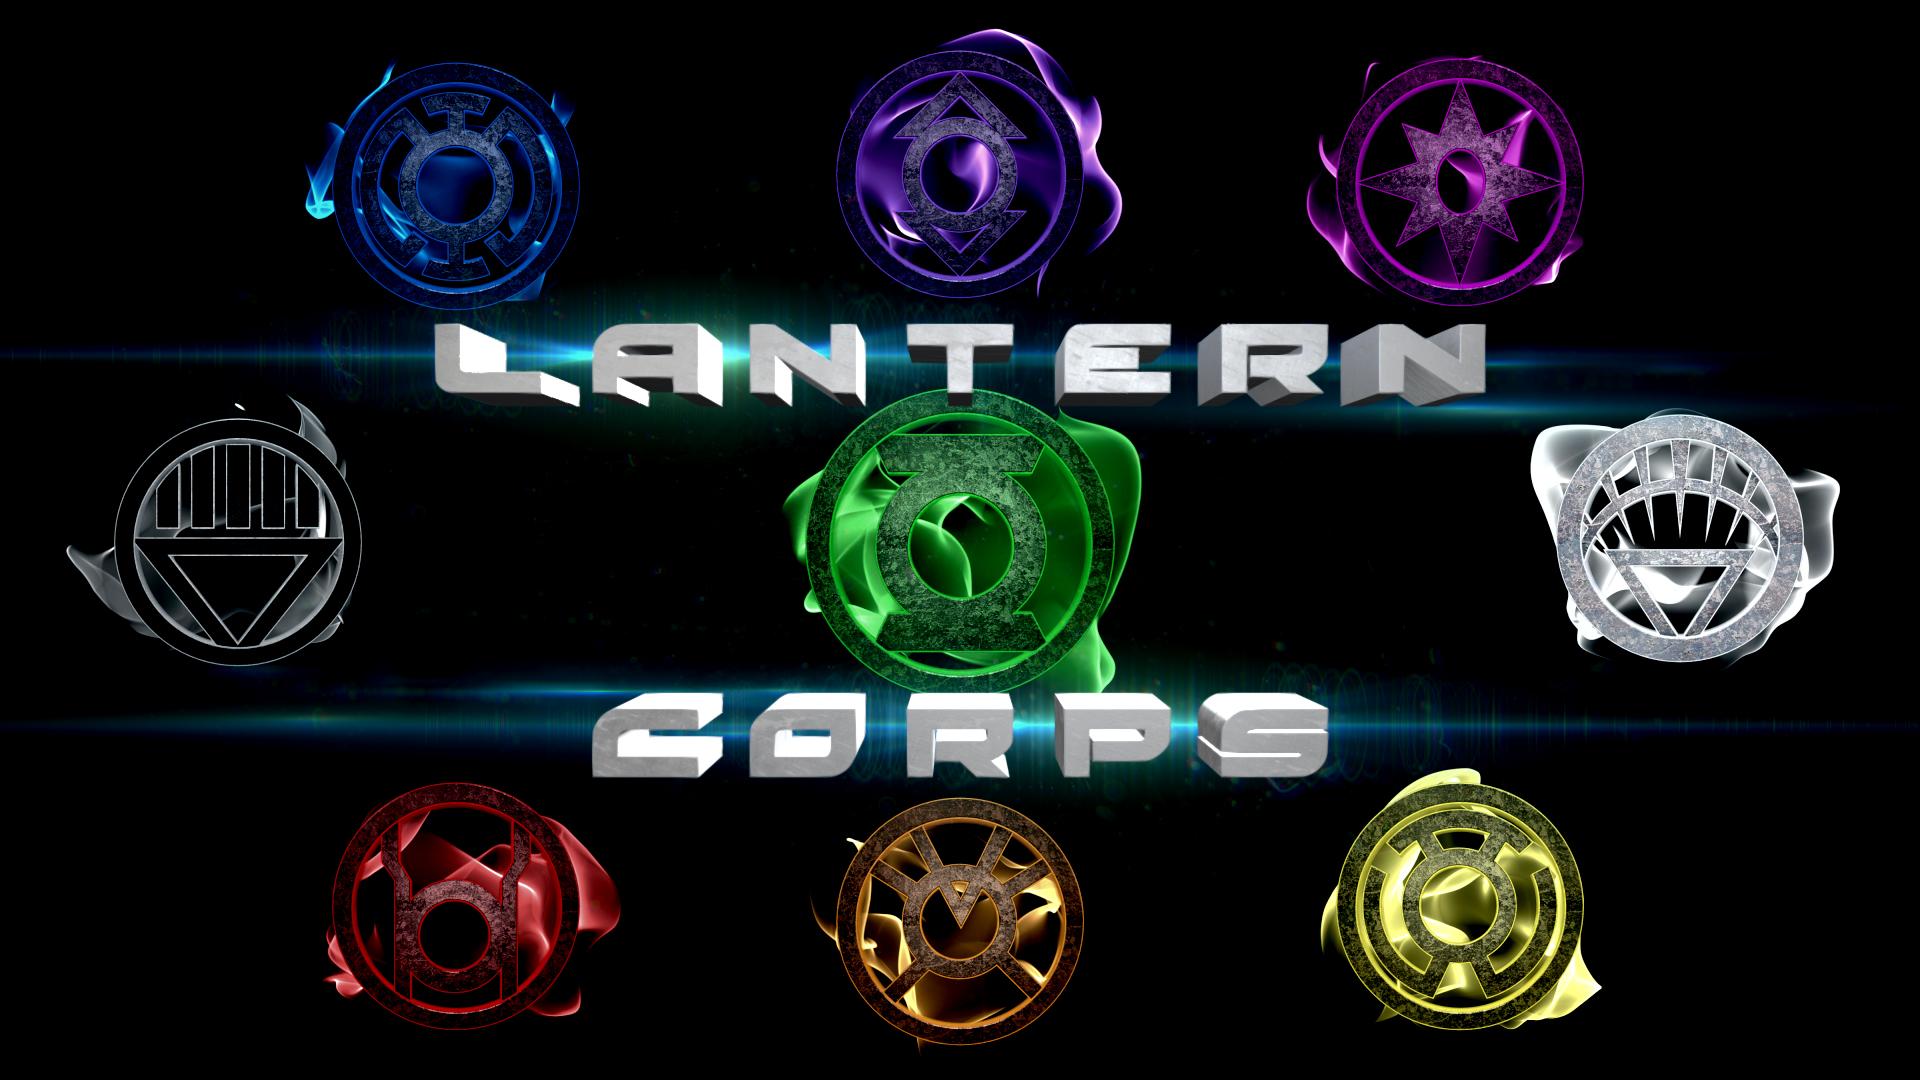 Lantern Corps Wallpaper [1920x1080] beloeil jonescom 1920x1080